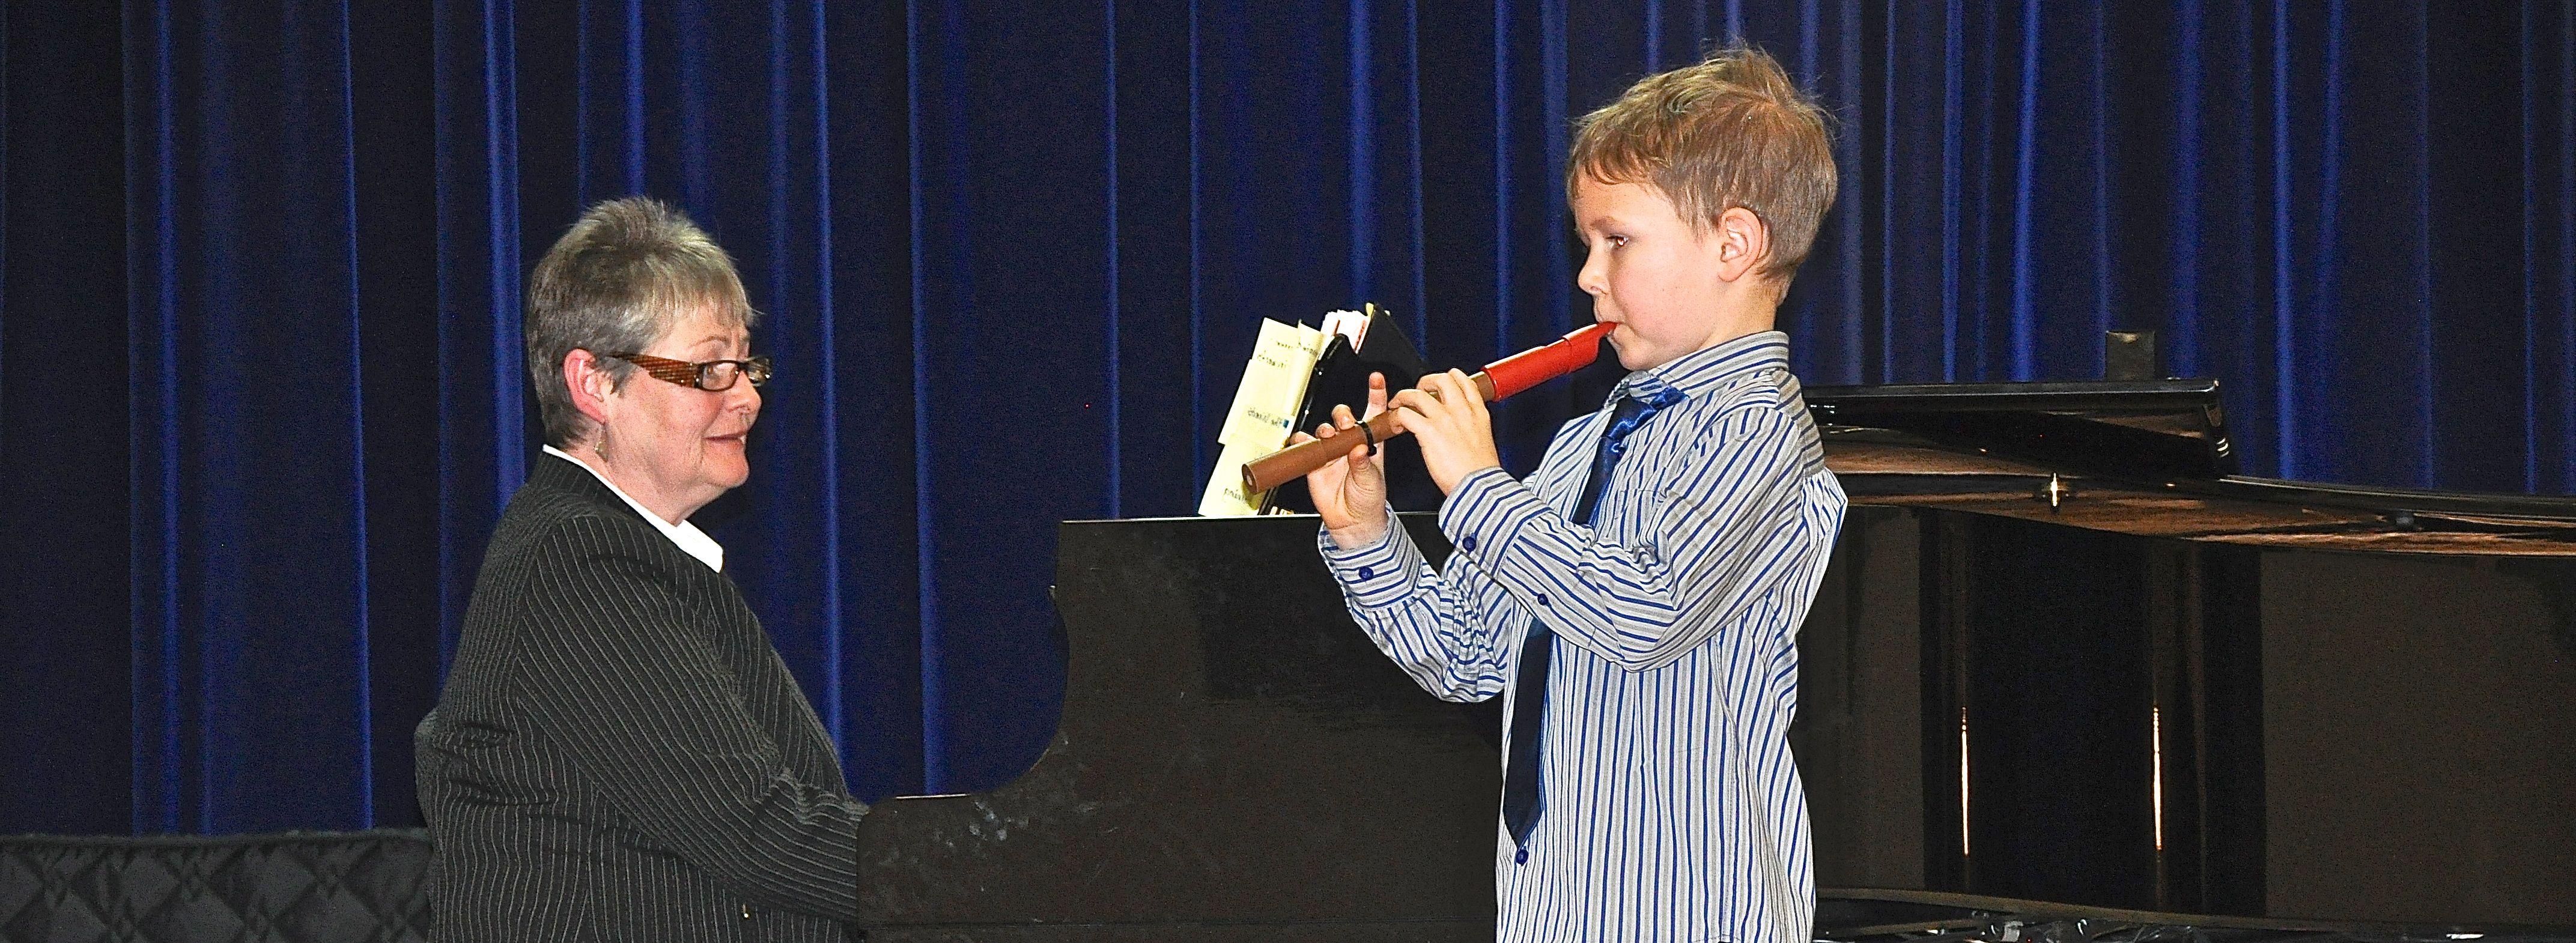 Boy recorder w: piano